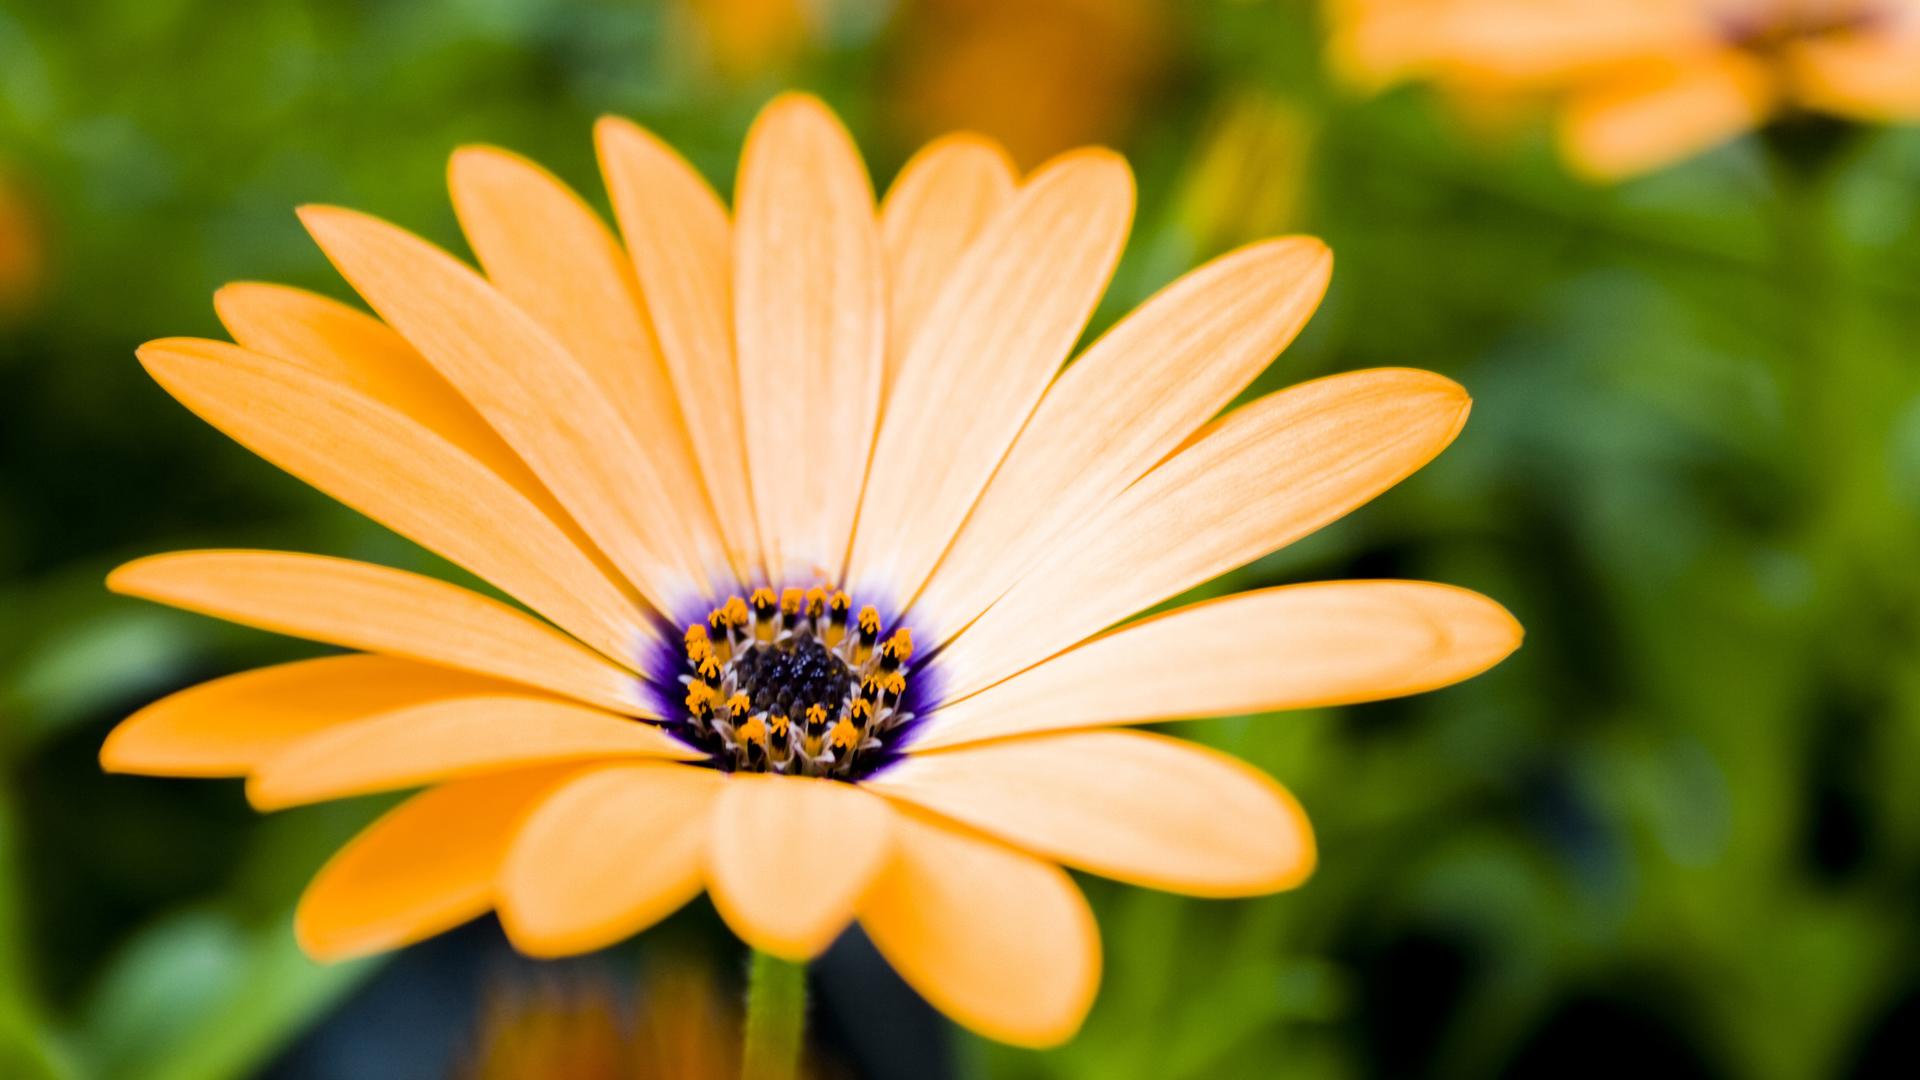 Flowers HD Widescreen Wallpaper